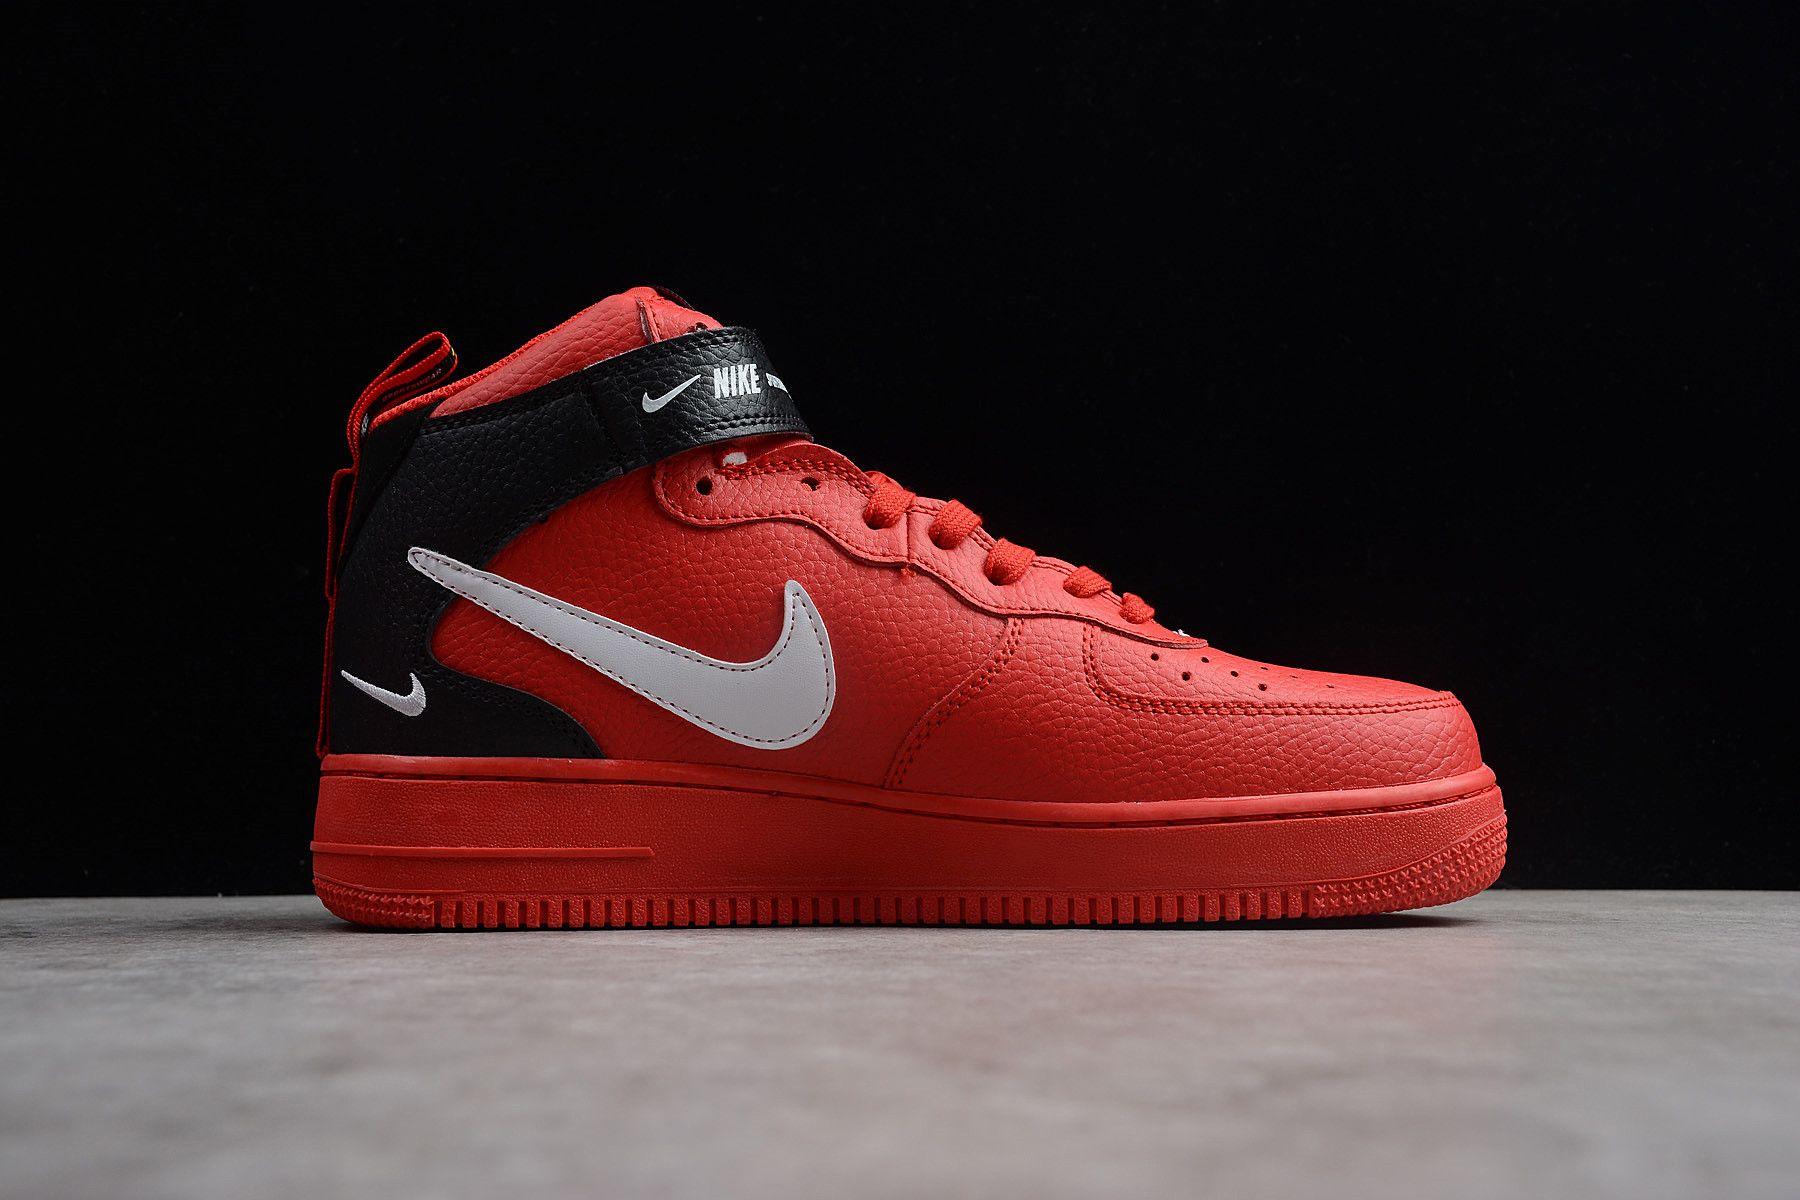 Nike Air Force 1 Mid '07 LV8 University Red/WhiteBlack